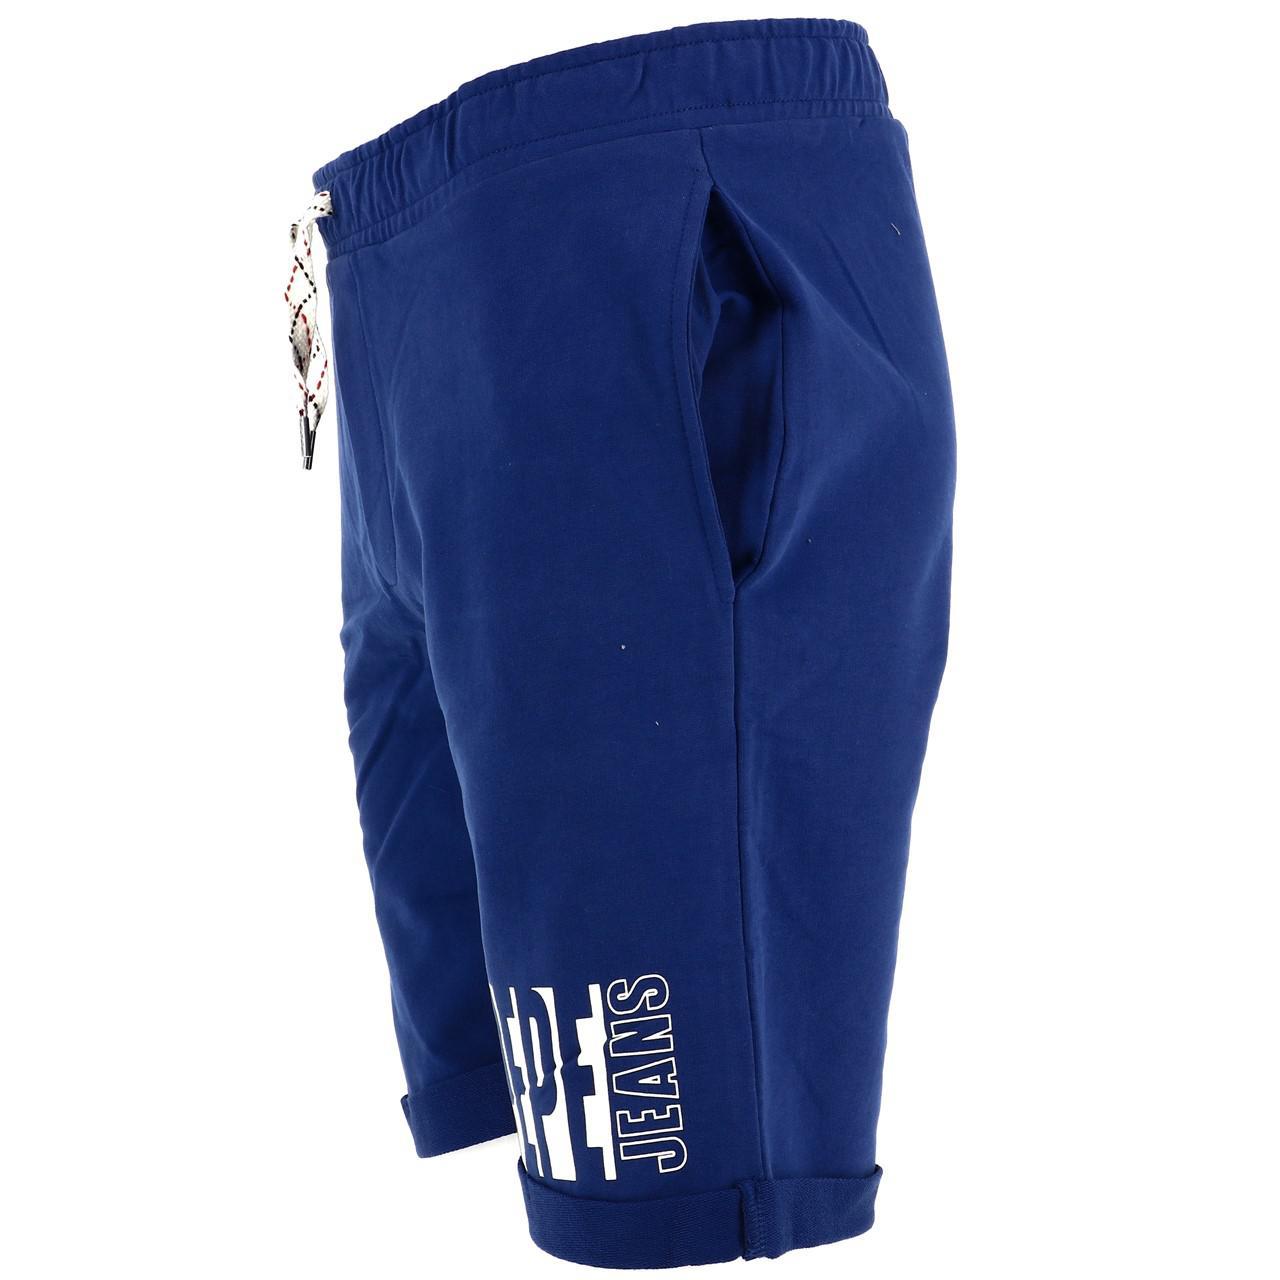 Bermuda-Shorts-Pepe-jeans-Otto-Navy-Shorts-Jr-Blue-17691-New thumbnail 2